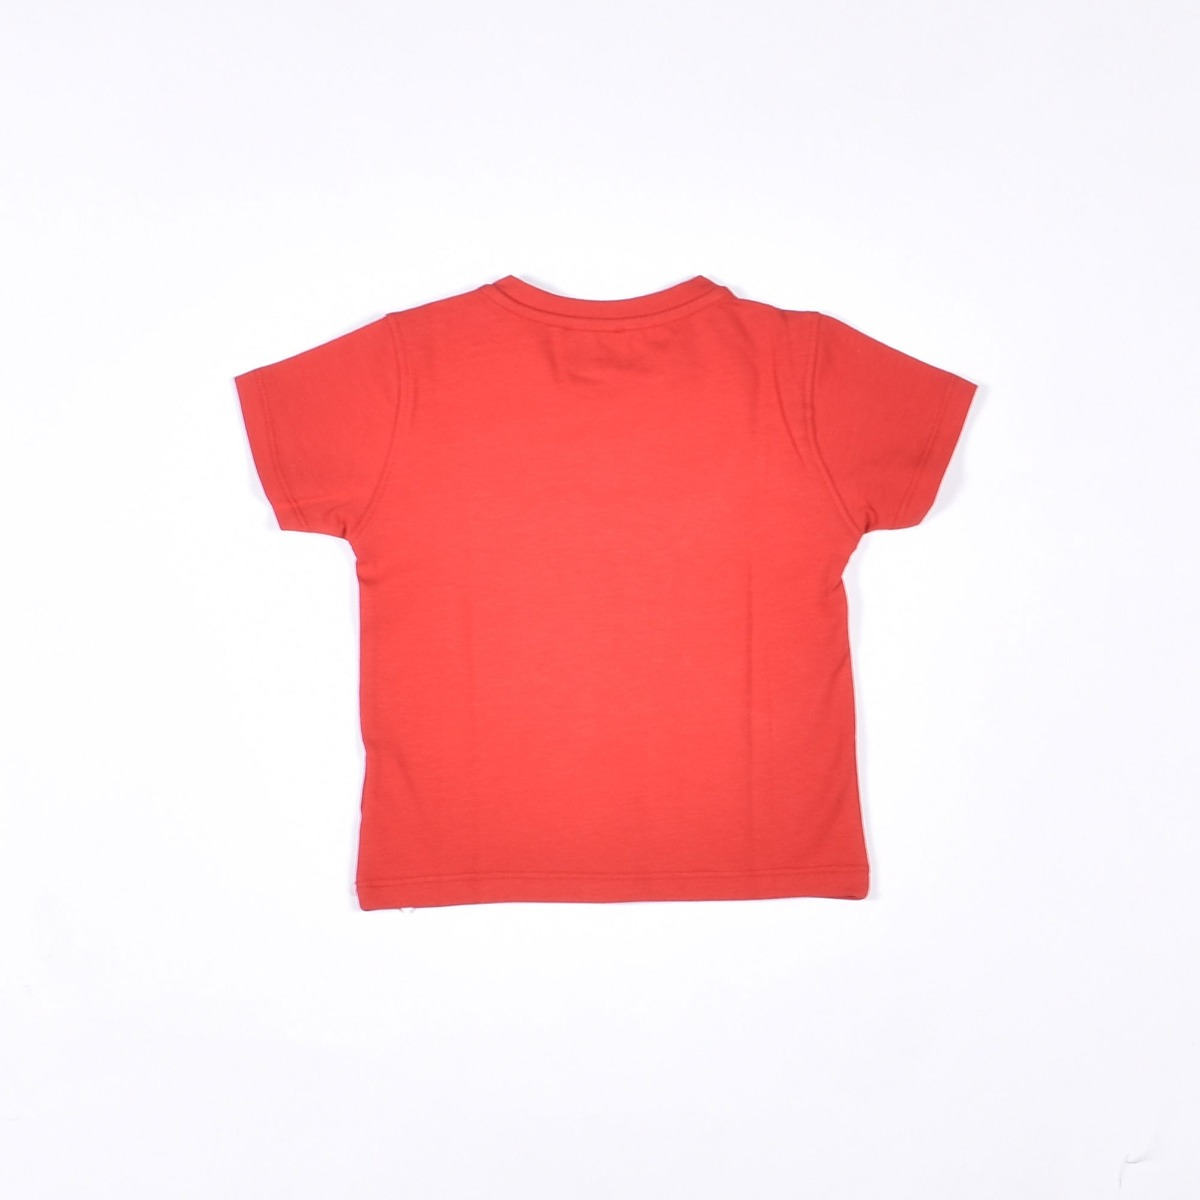 T-shirt fascia logata - Rossa